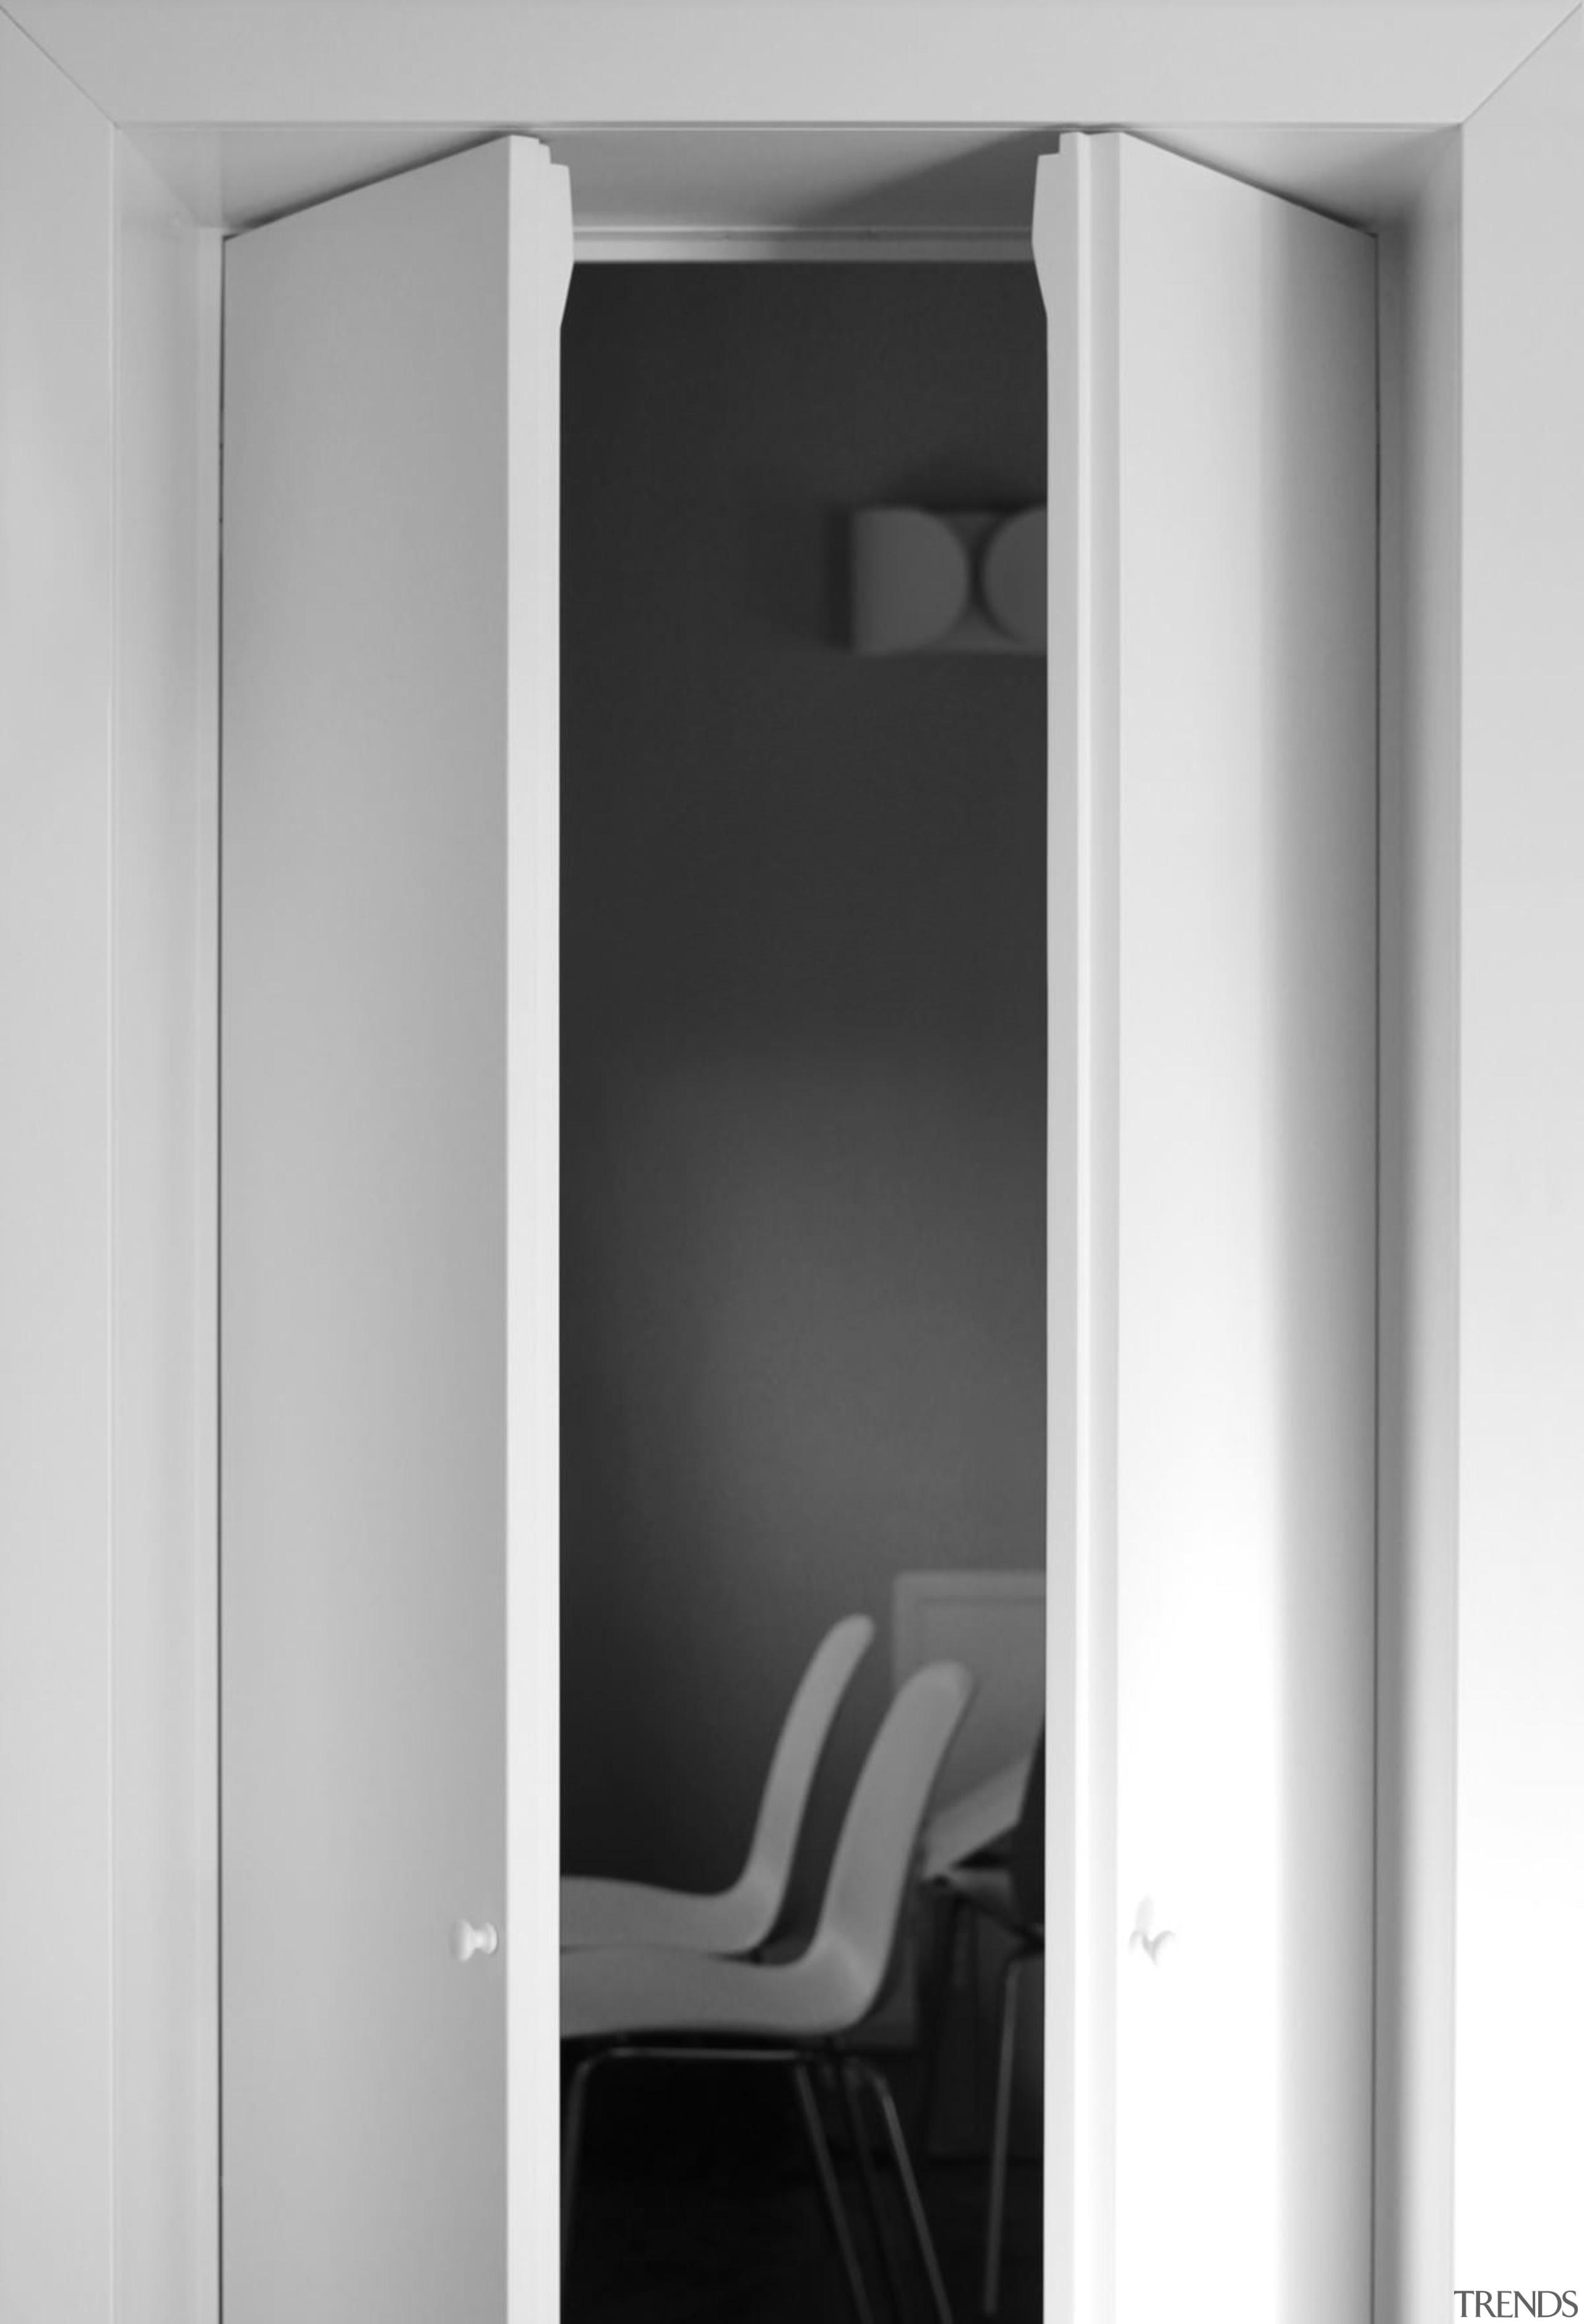 Architect: Tisselli Studio ArchitettiPhotography by Filippo Tisselli angle, bathroom accessory, black and white, monochrome, product, product design, white